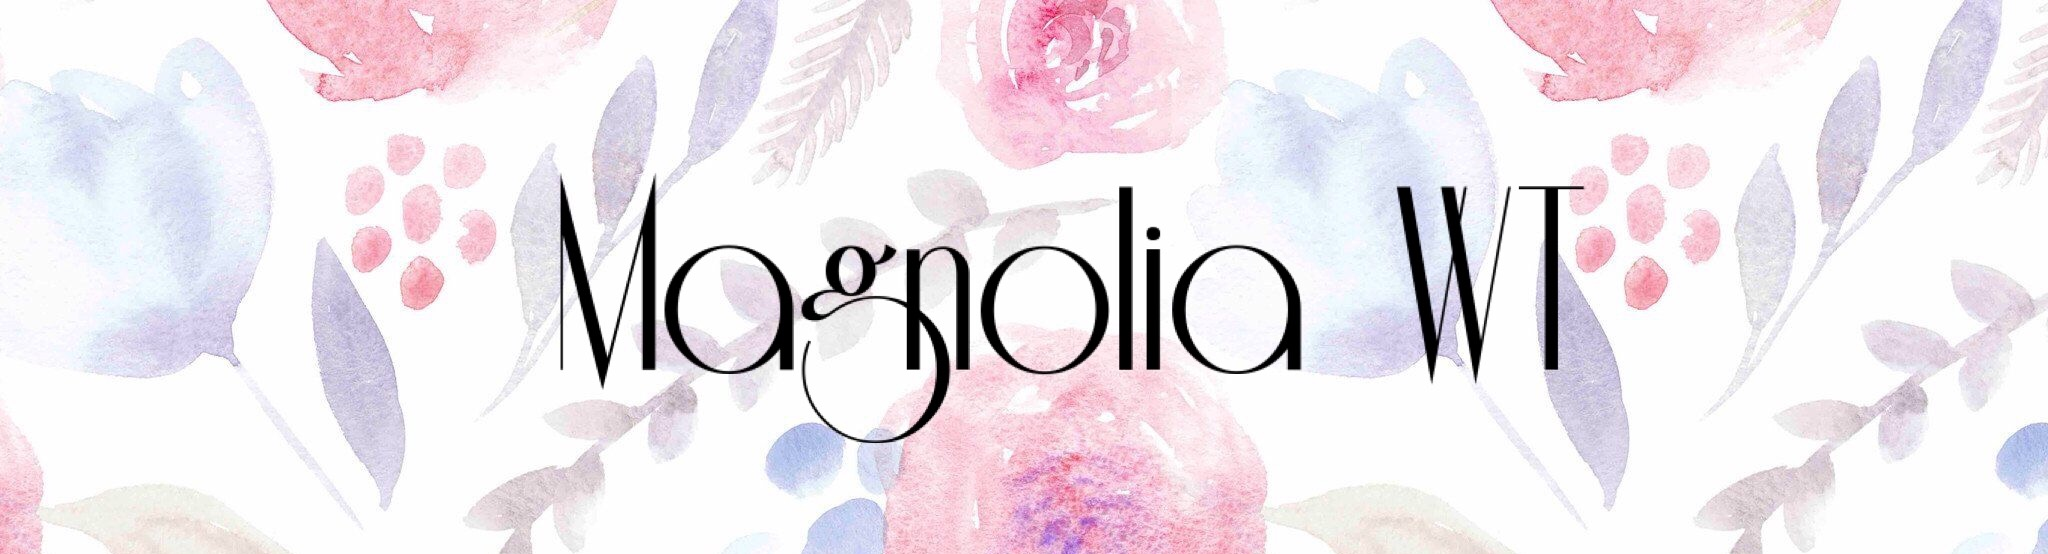 Magnolia WT公式通販サイト